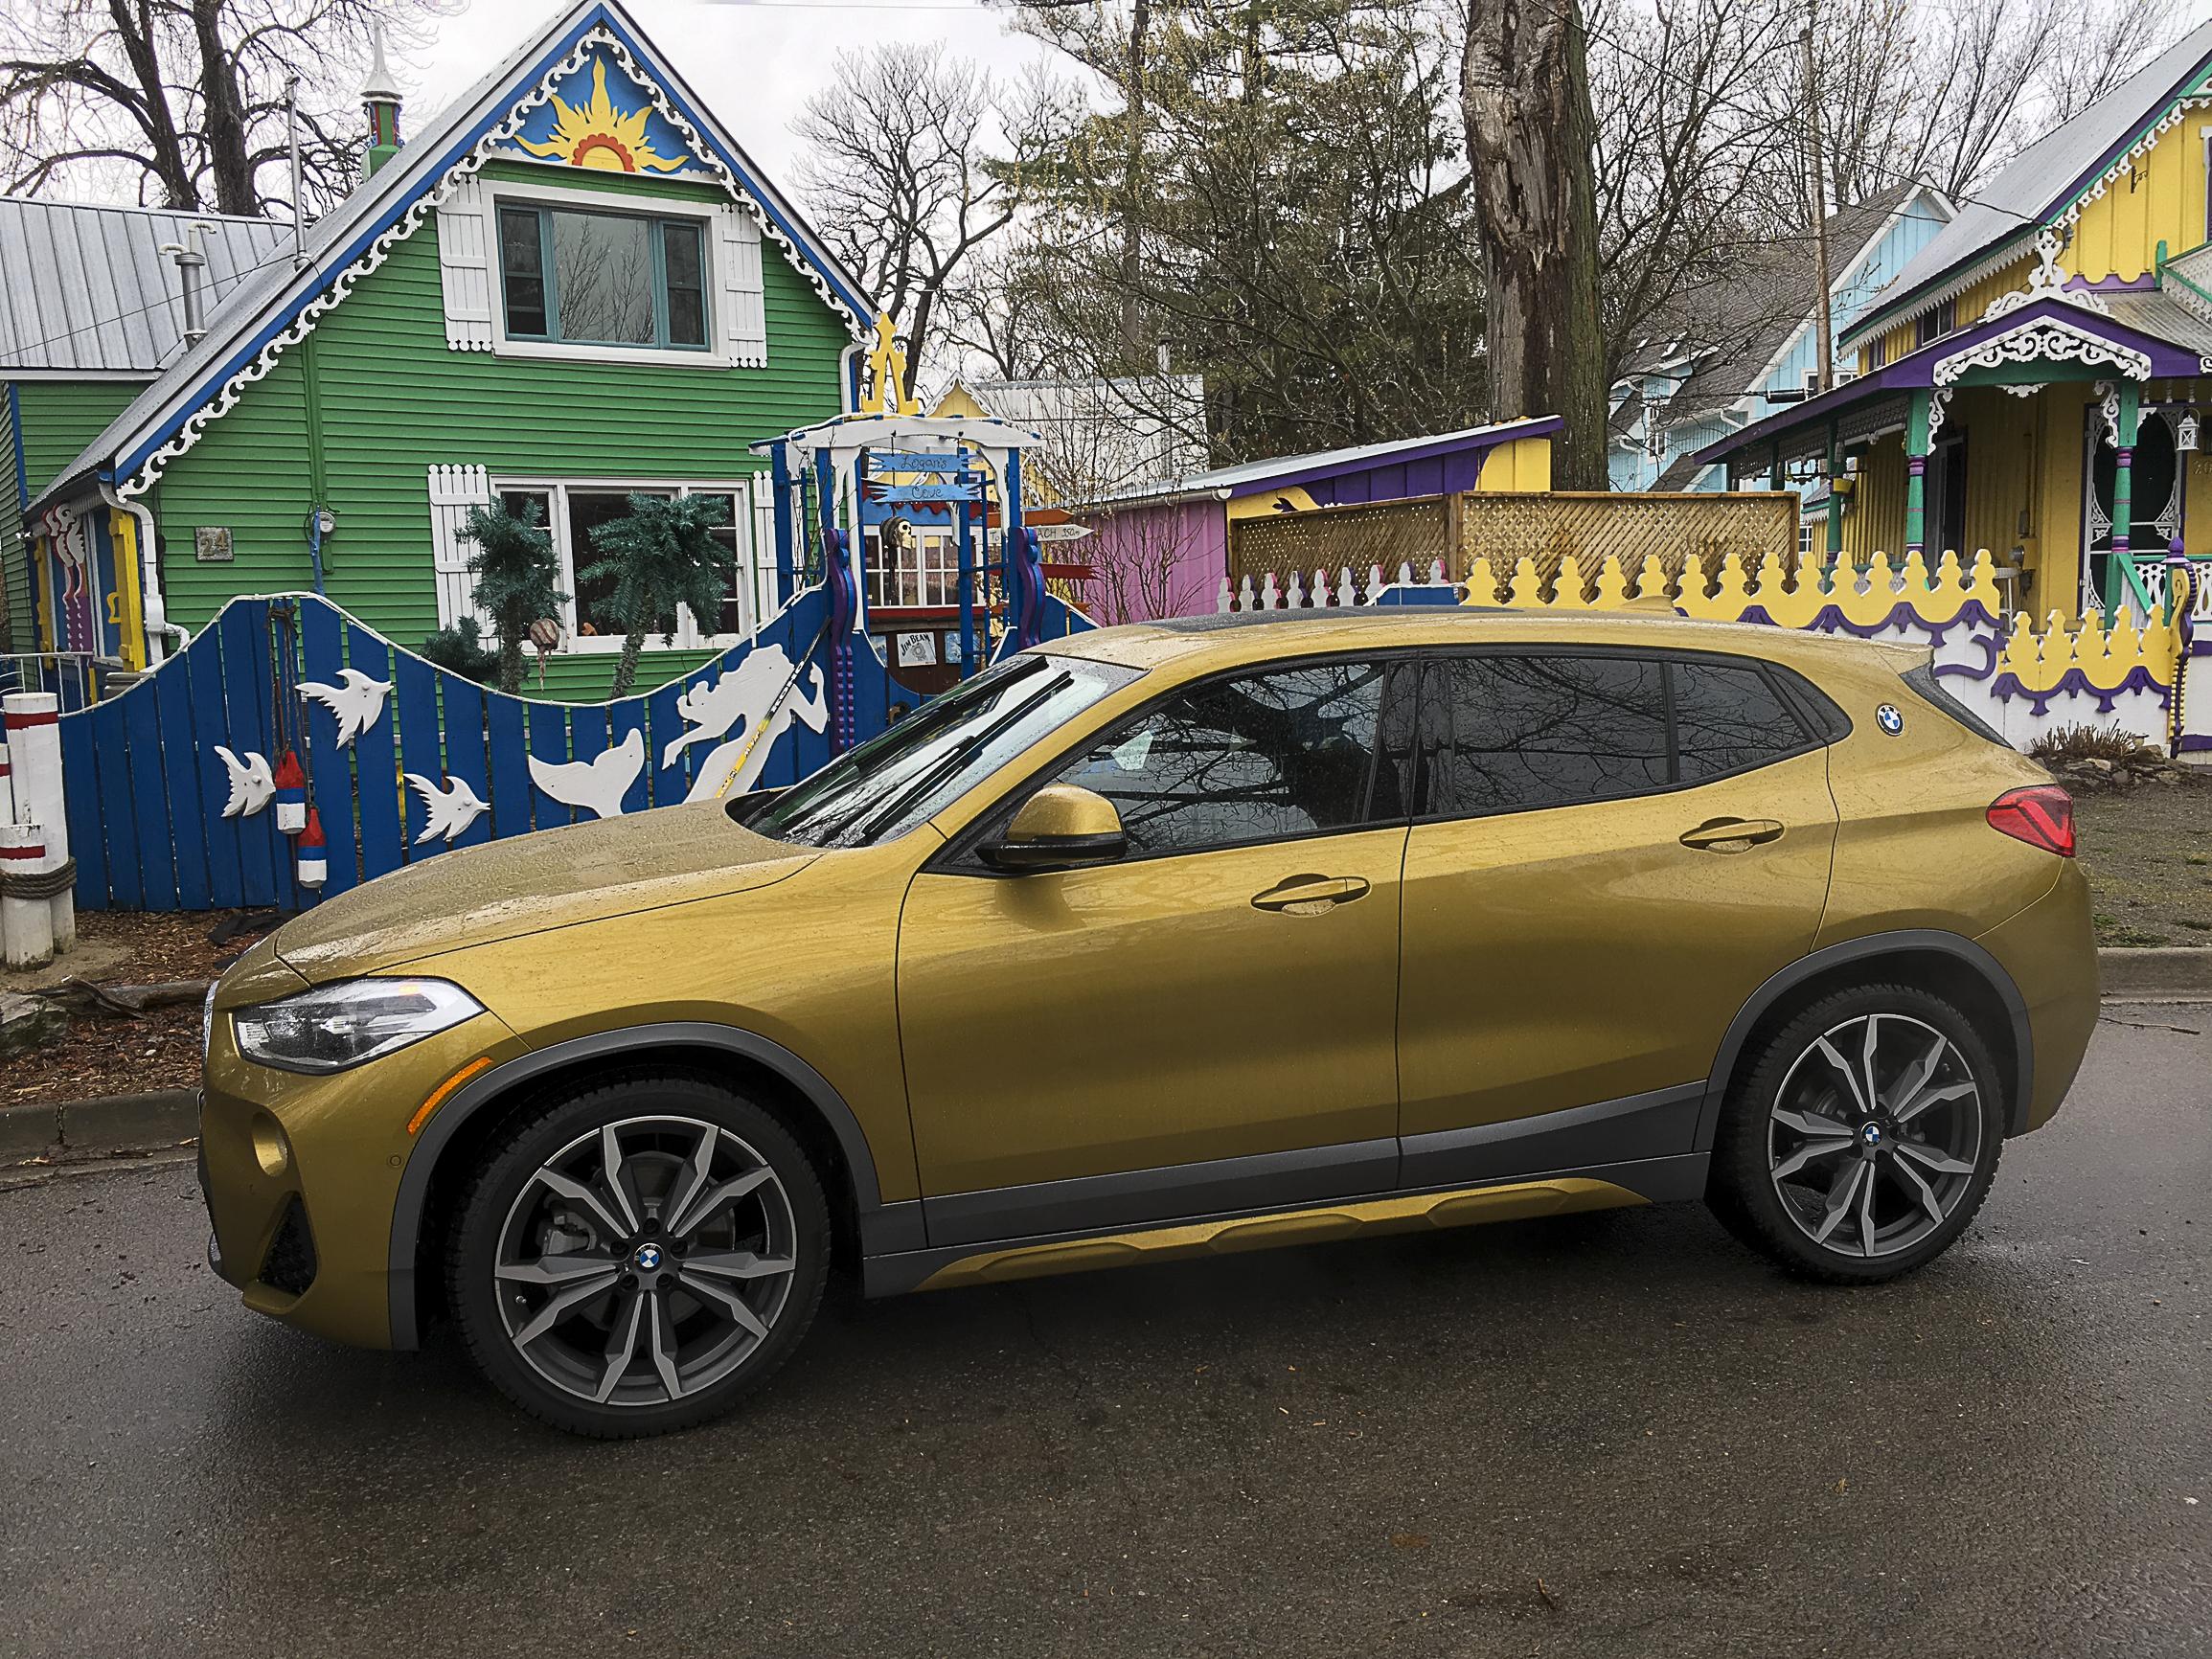 Road Trip: 2018 BMW X2 to Niagara